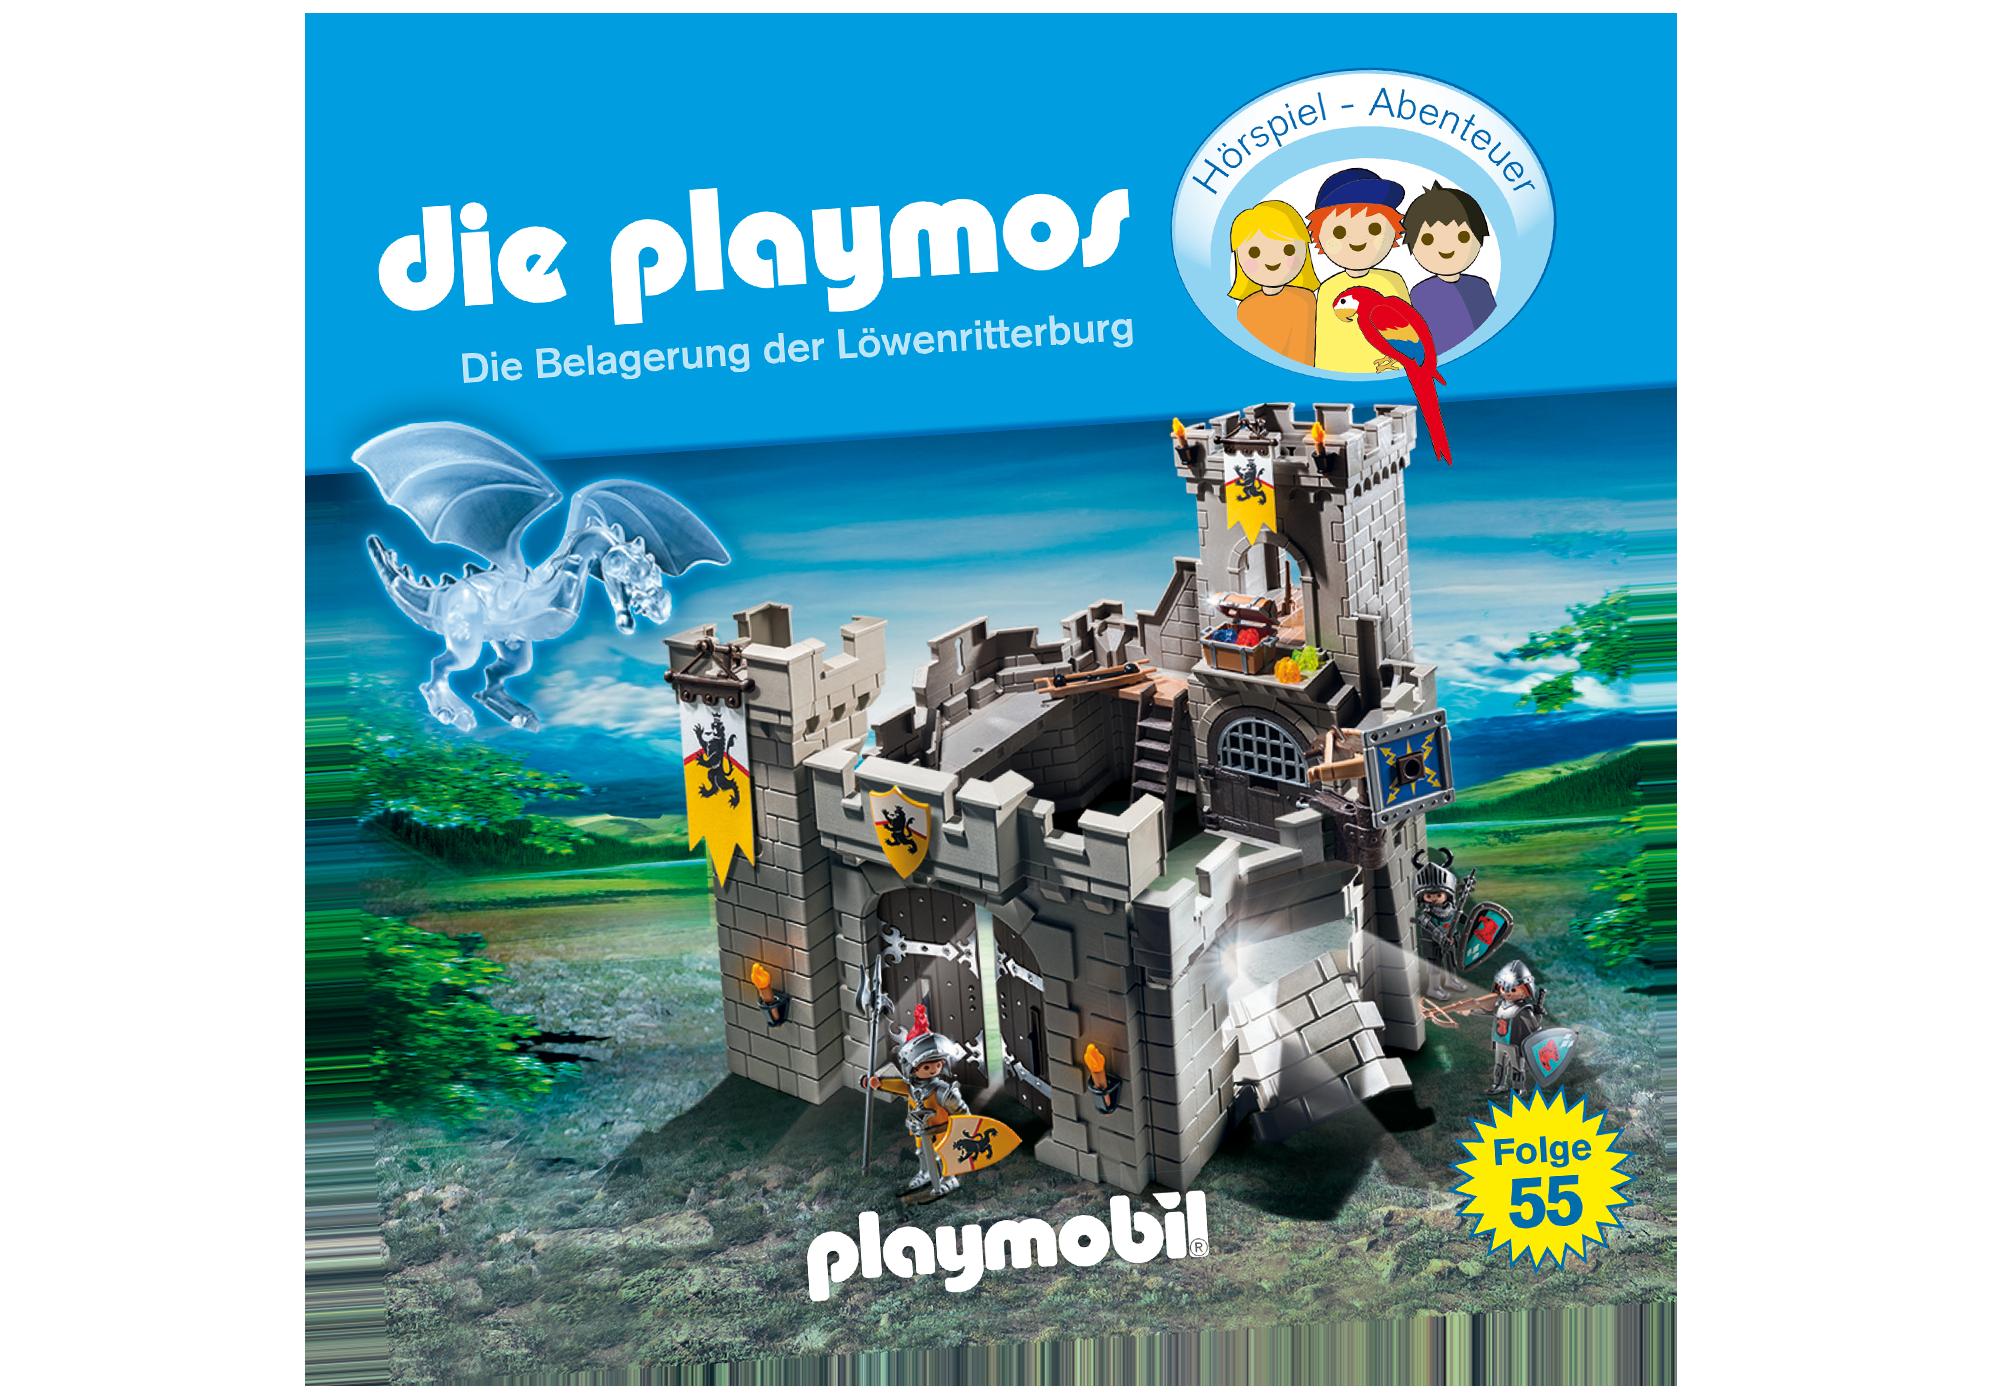 http://media.playmobil.com/i/playmobil/80484_product_detail